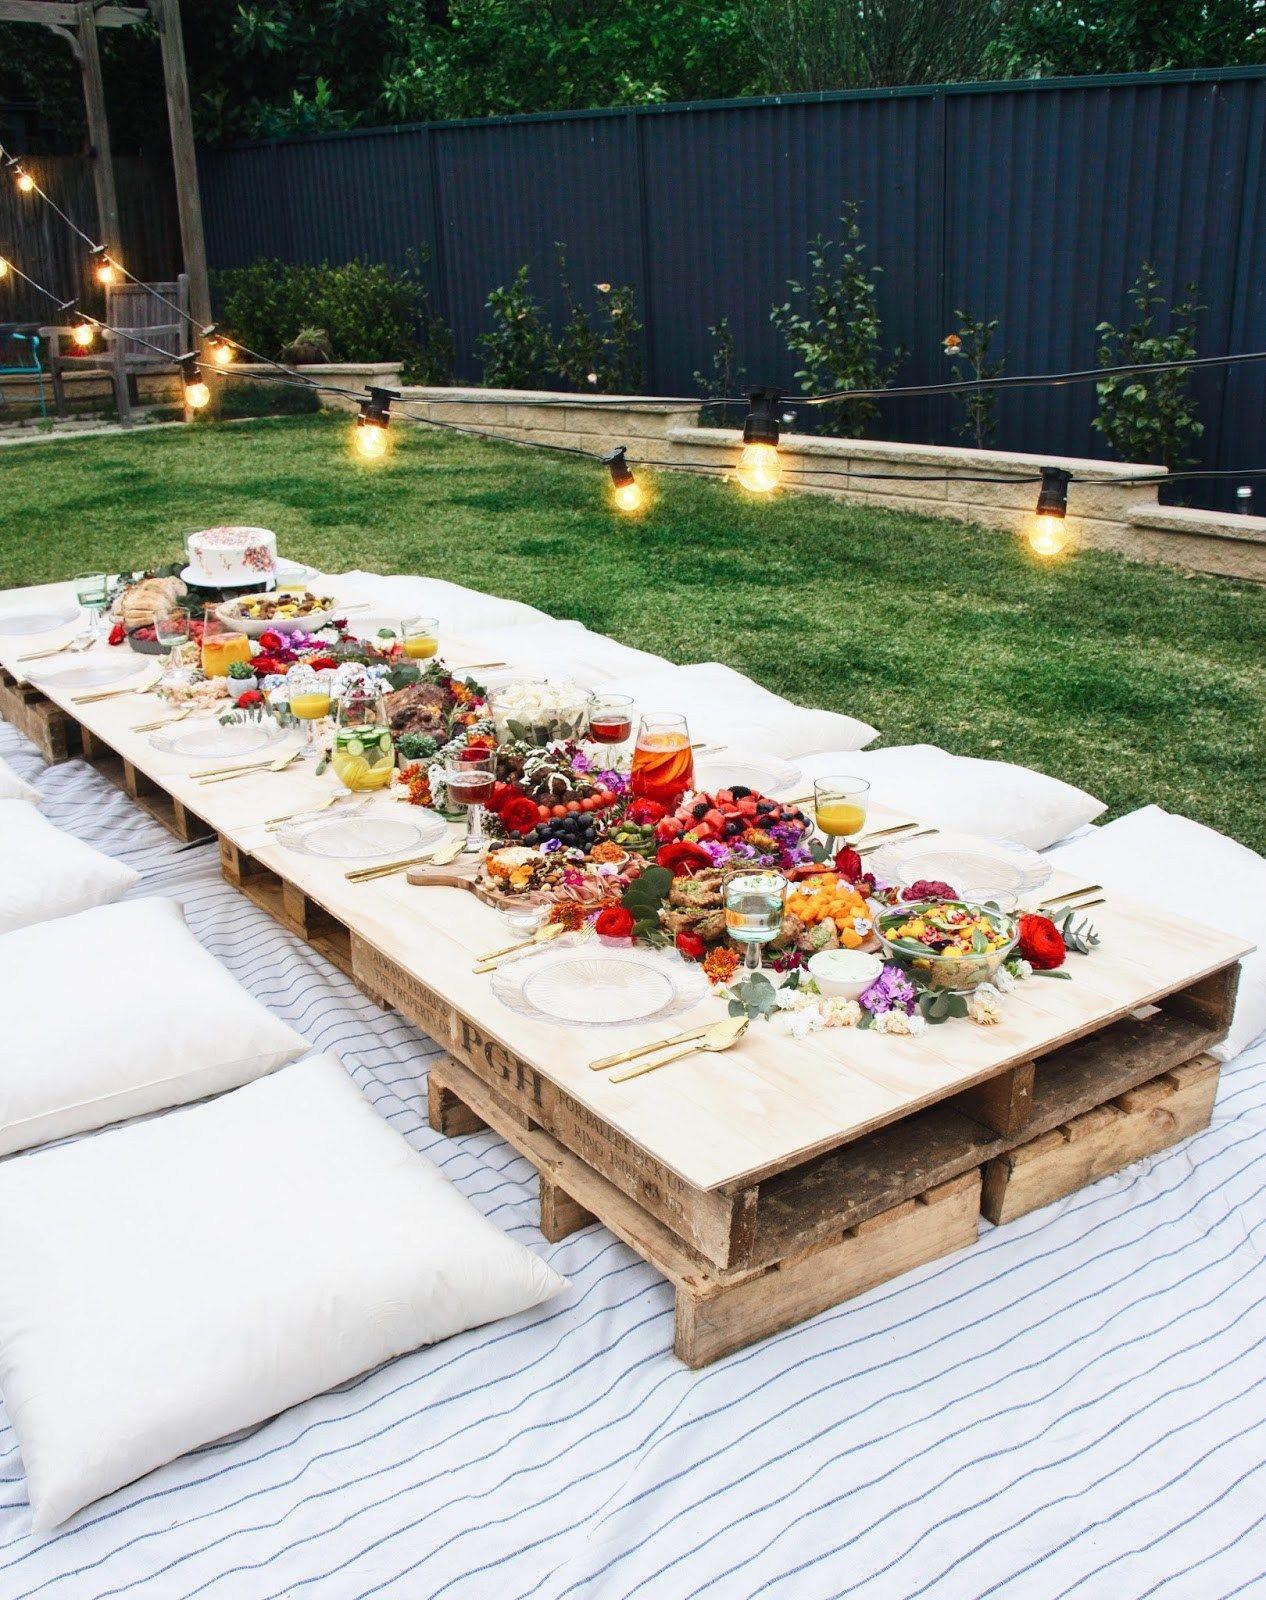 Short wooden table in garden full of food